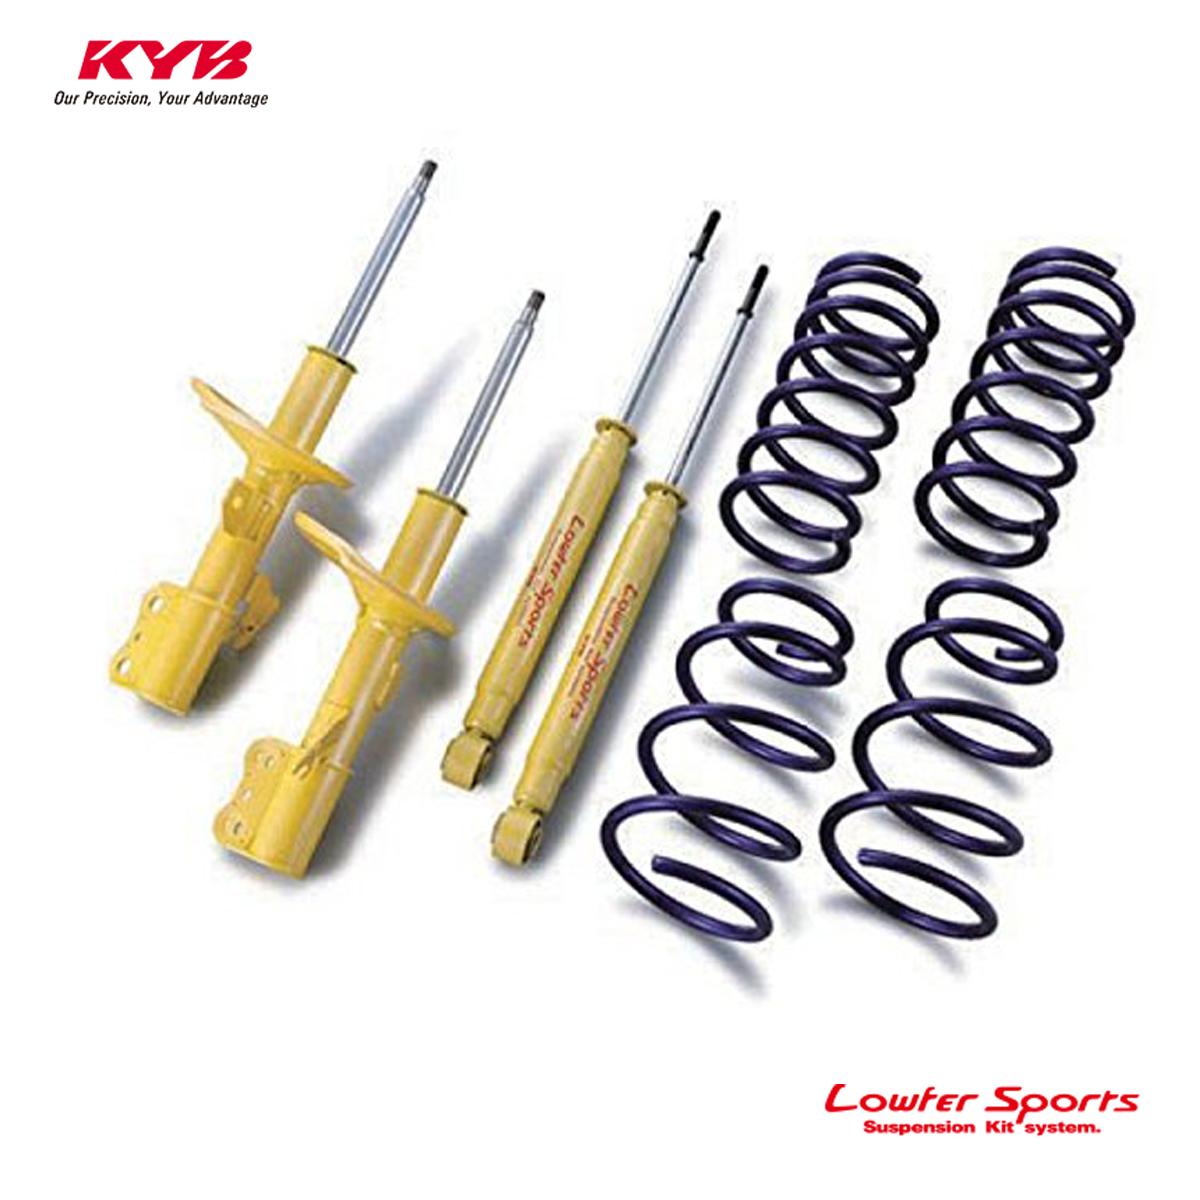 KYB カヤバ ステップワゴン RF1 ショックアブソーバー サスペンションキット Lowfer Sports LKIT-RF1 配送先条件有り